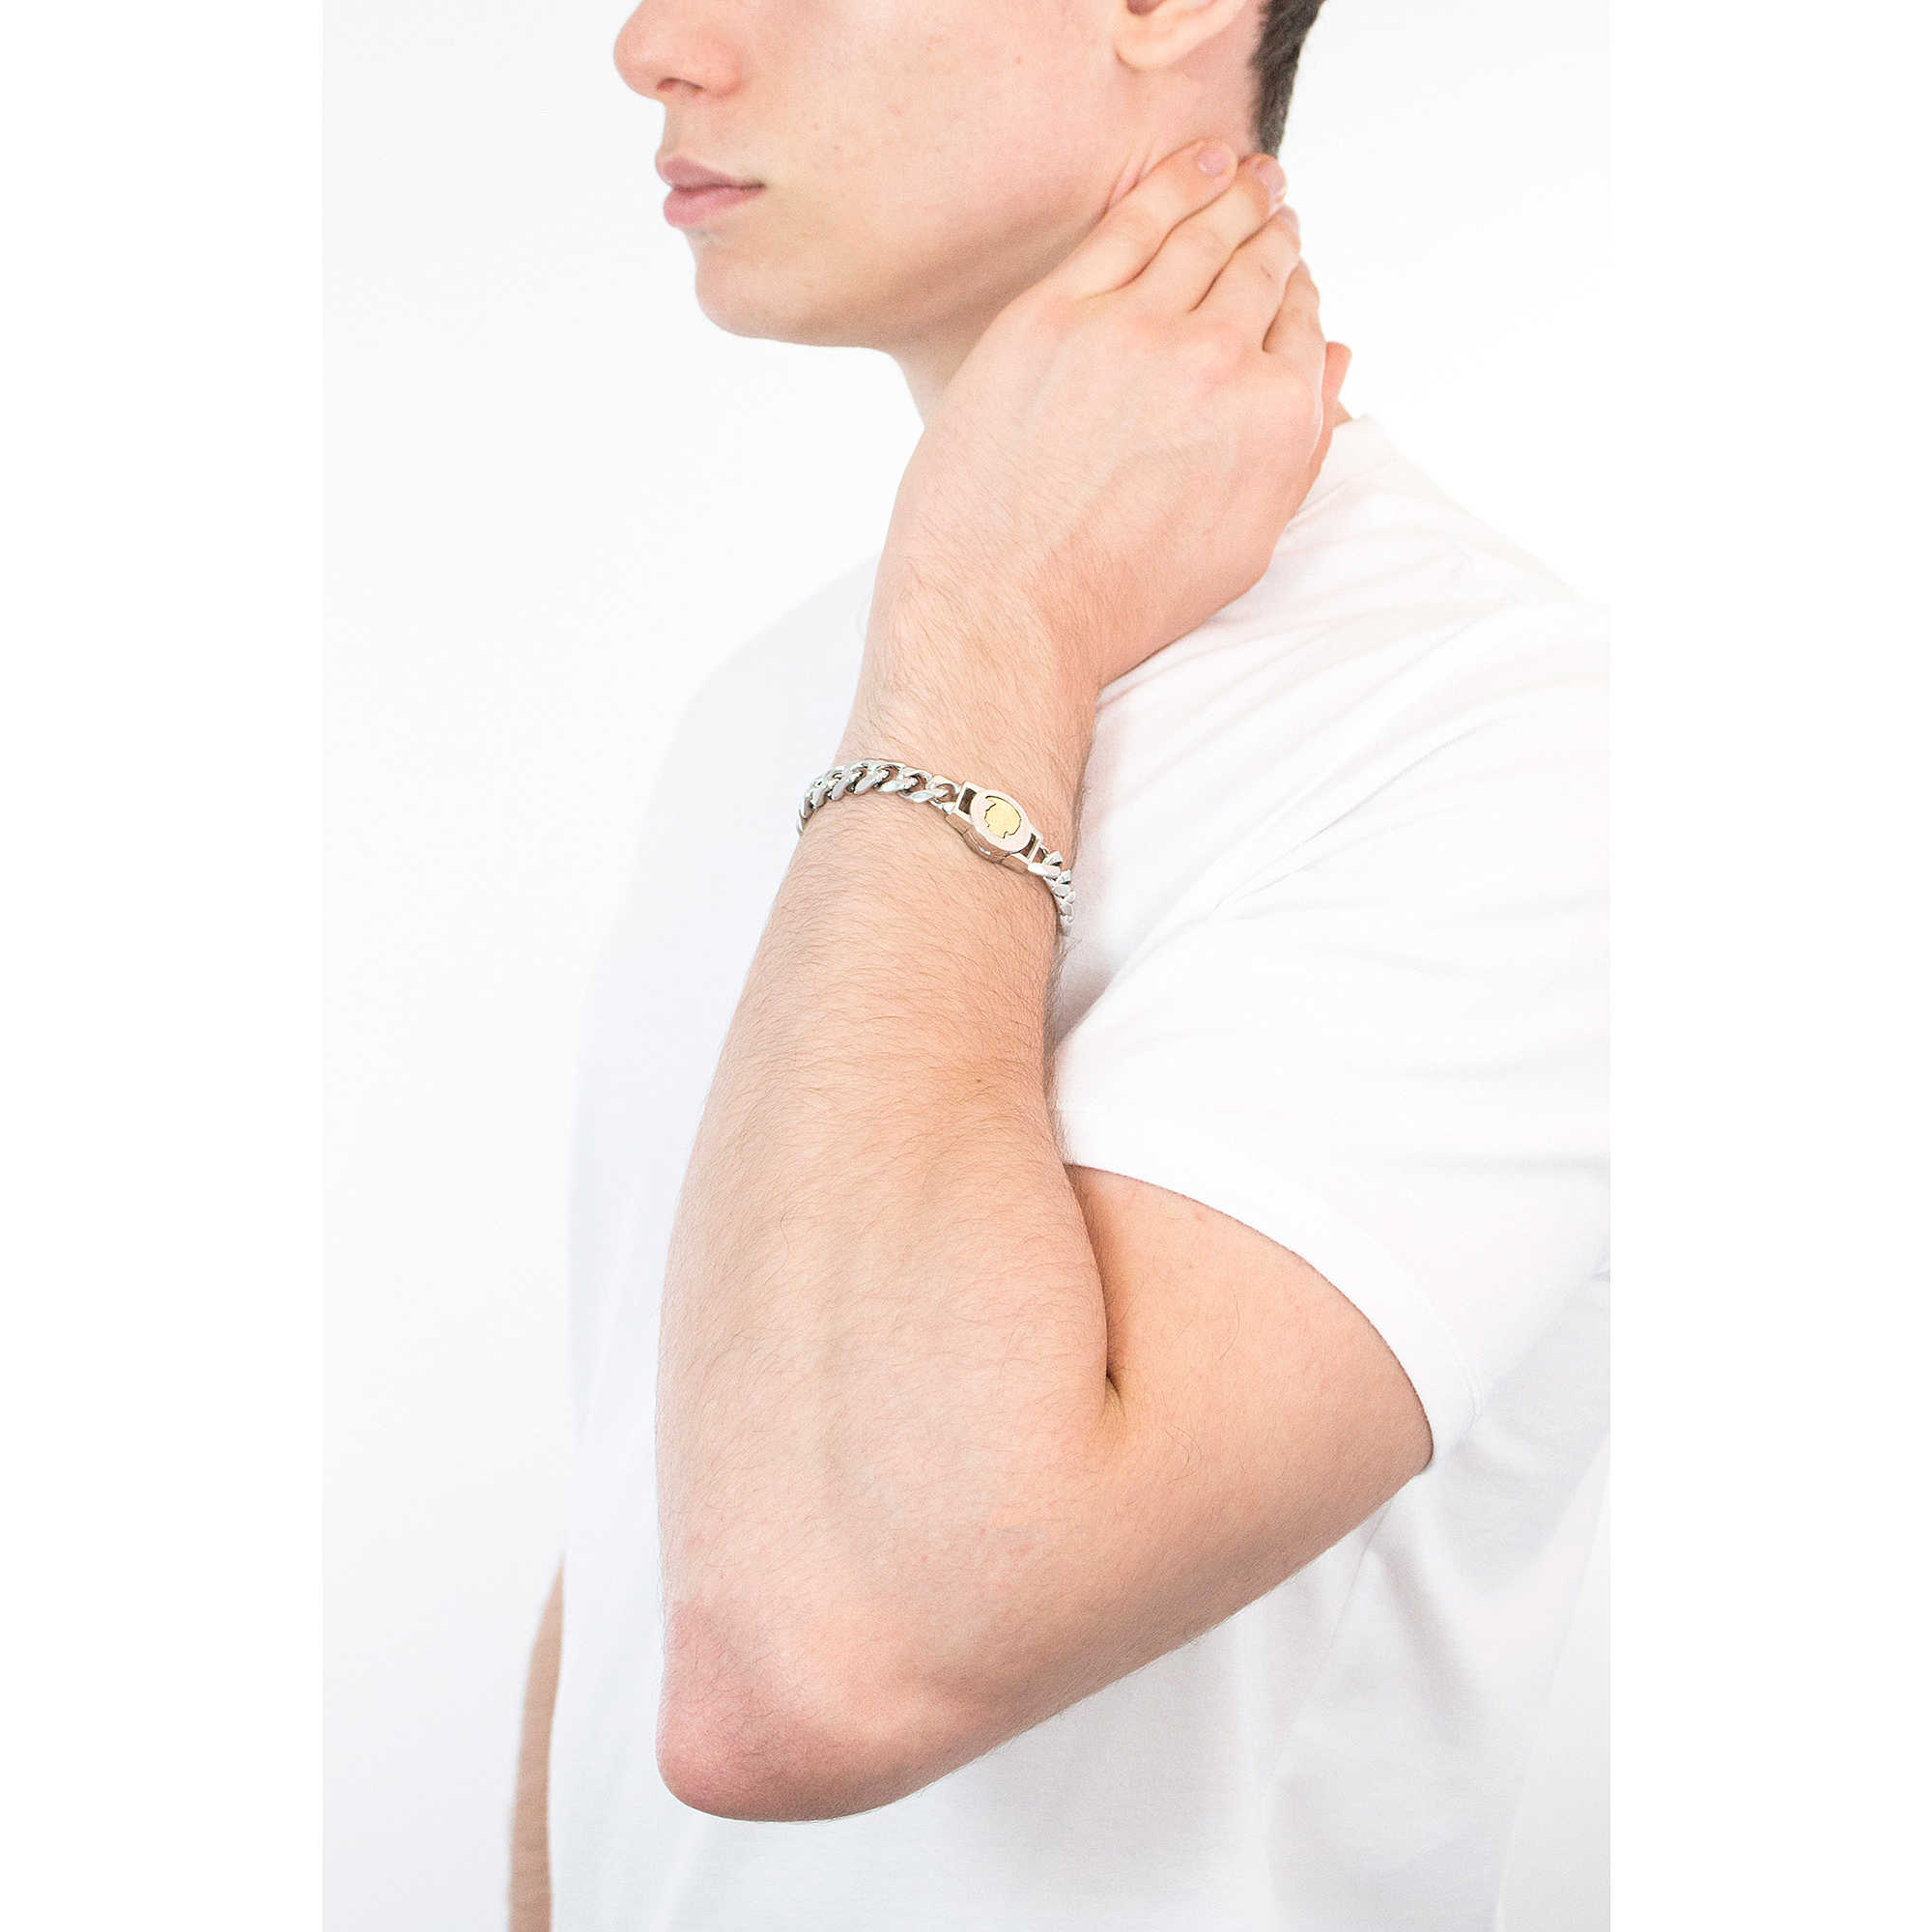 bracelet man jewellery Diesel Steel DX1124040. zoom · Diesel bracelets  Steel man DX1124040 photo wearing. zoom 56536e1983a0